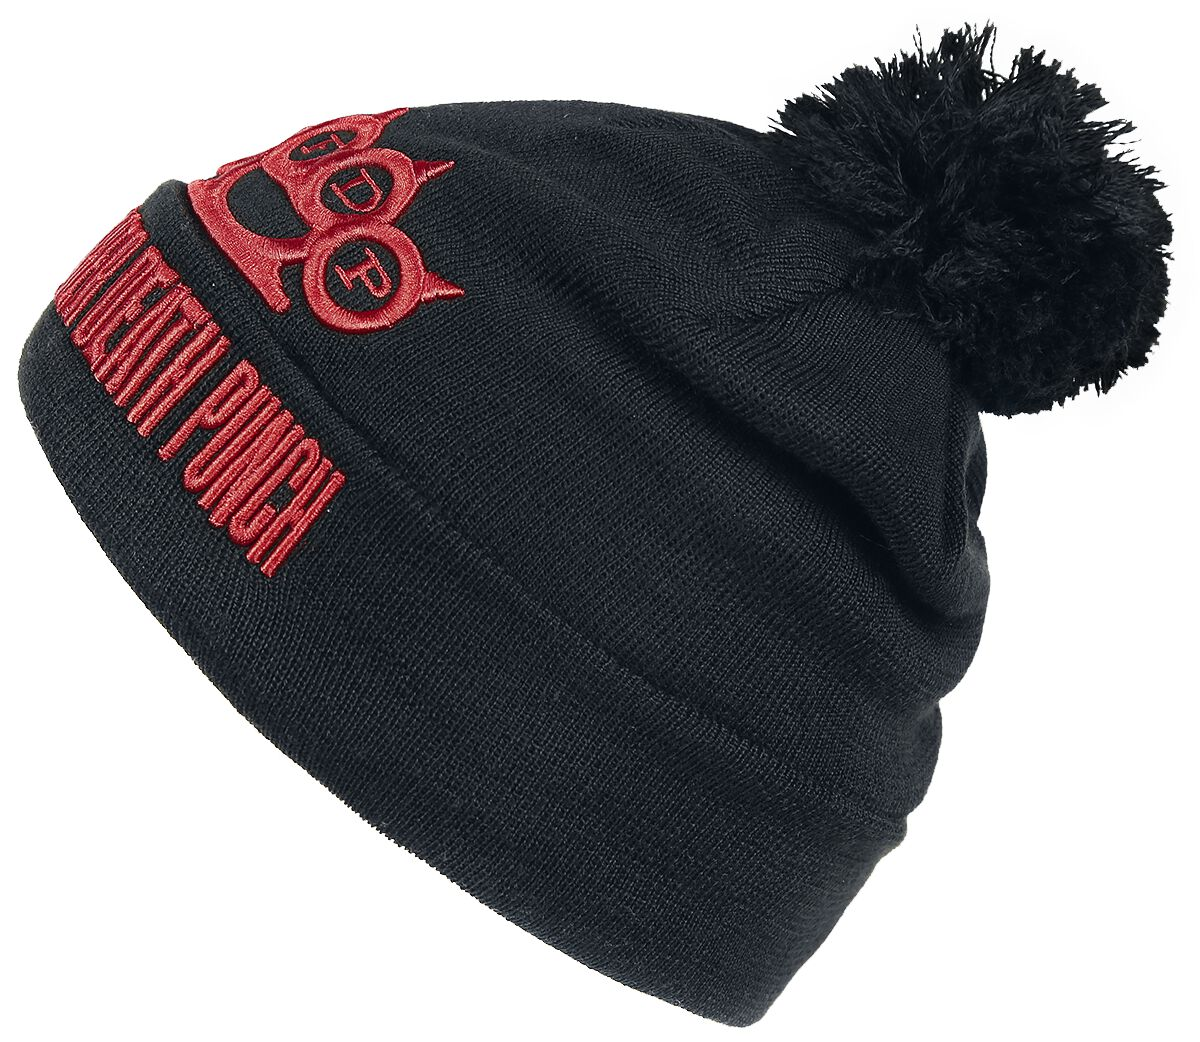 Image of   Five Finger Death Punch Logo Beanie Beanie sort